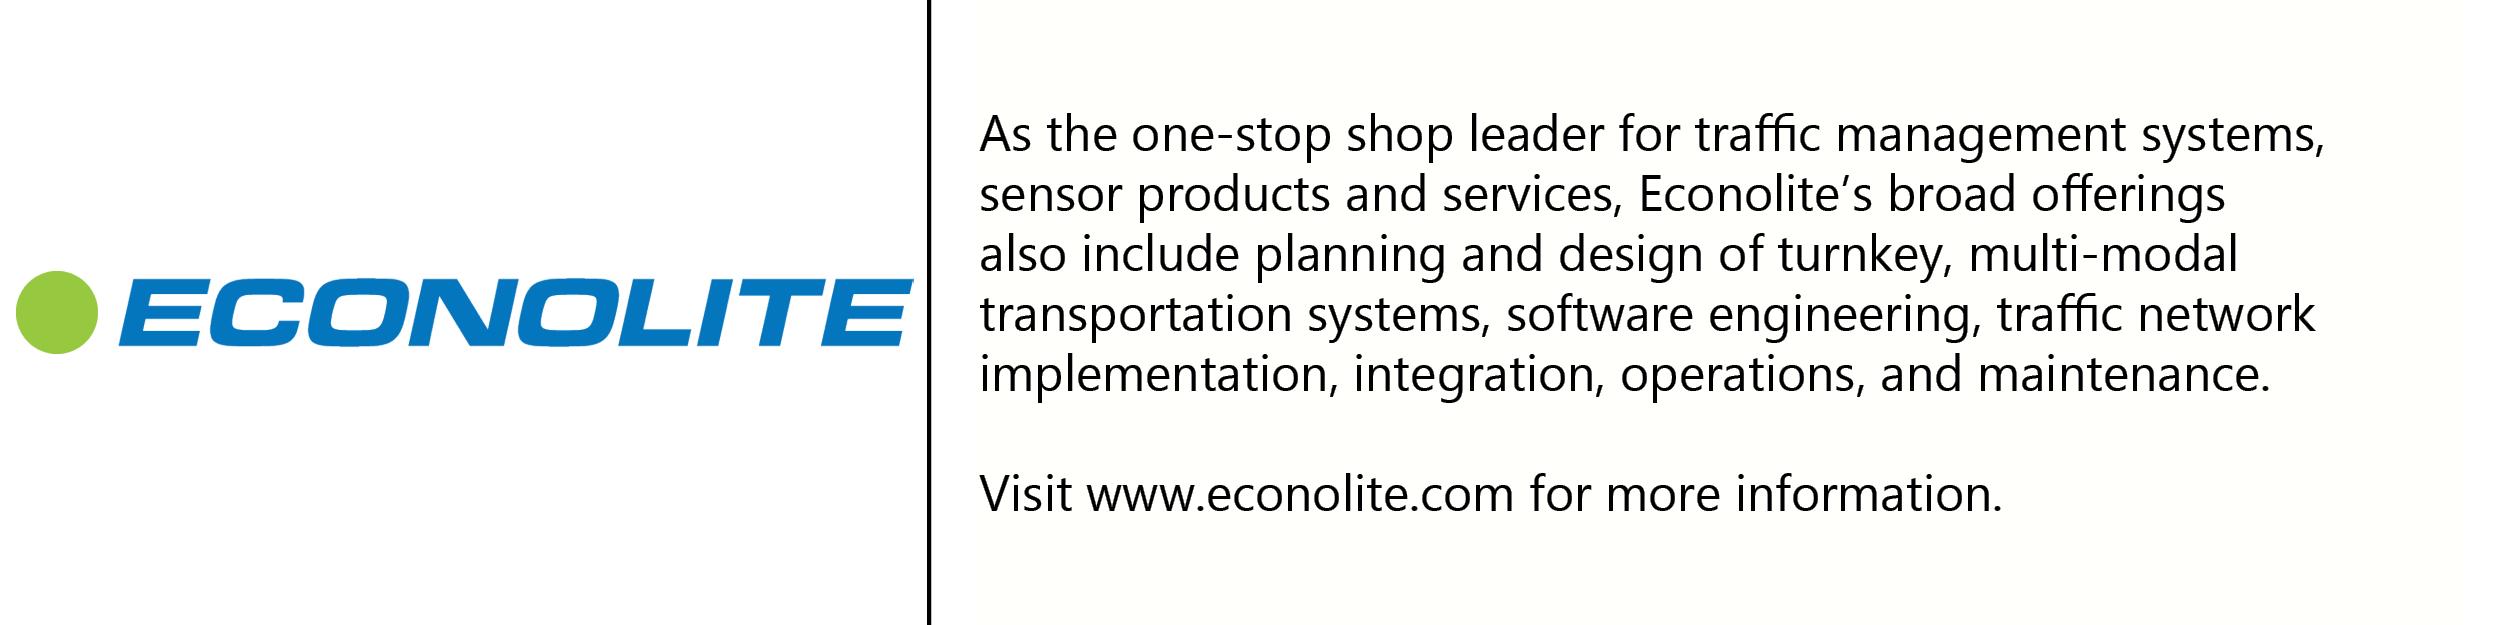 Econolite logo with description of company